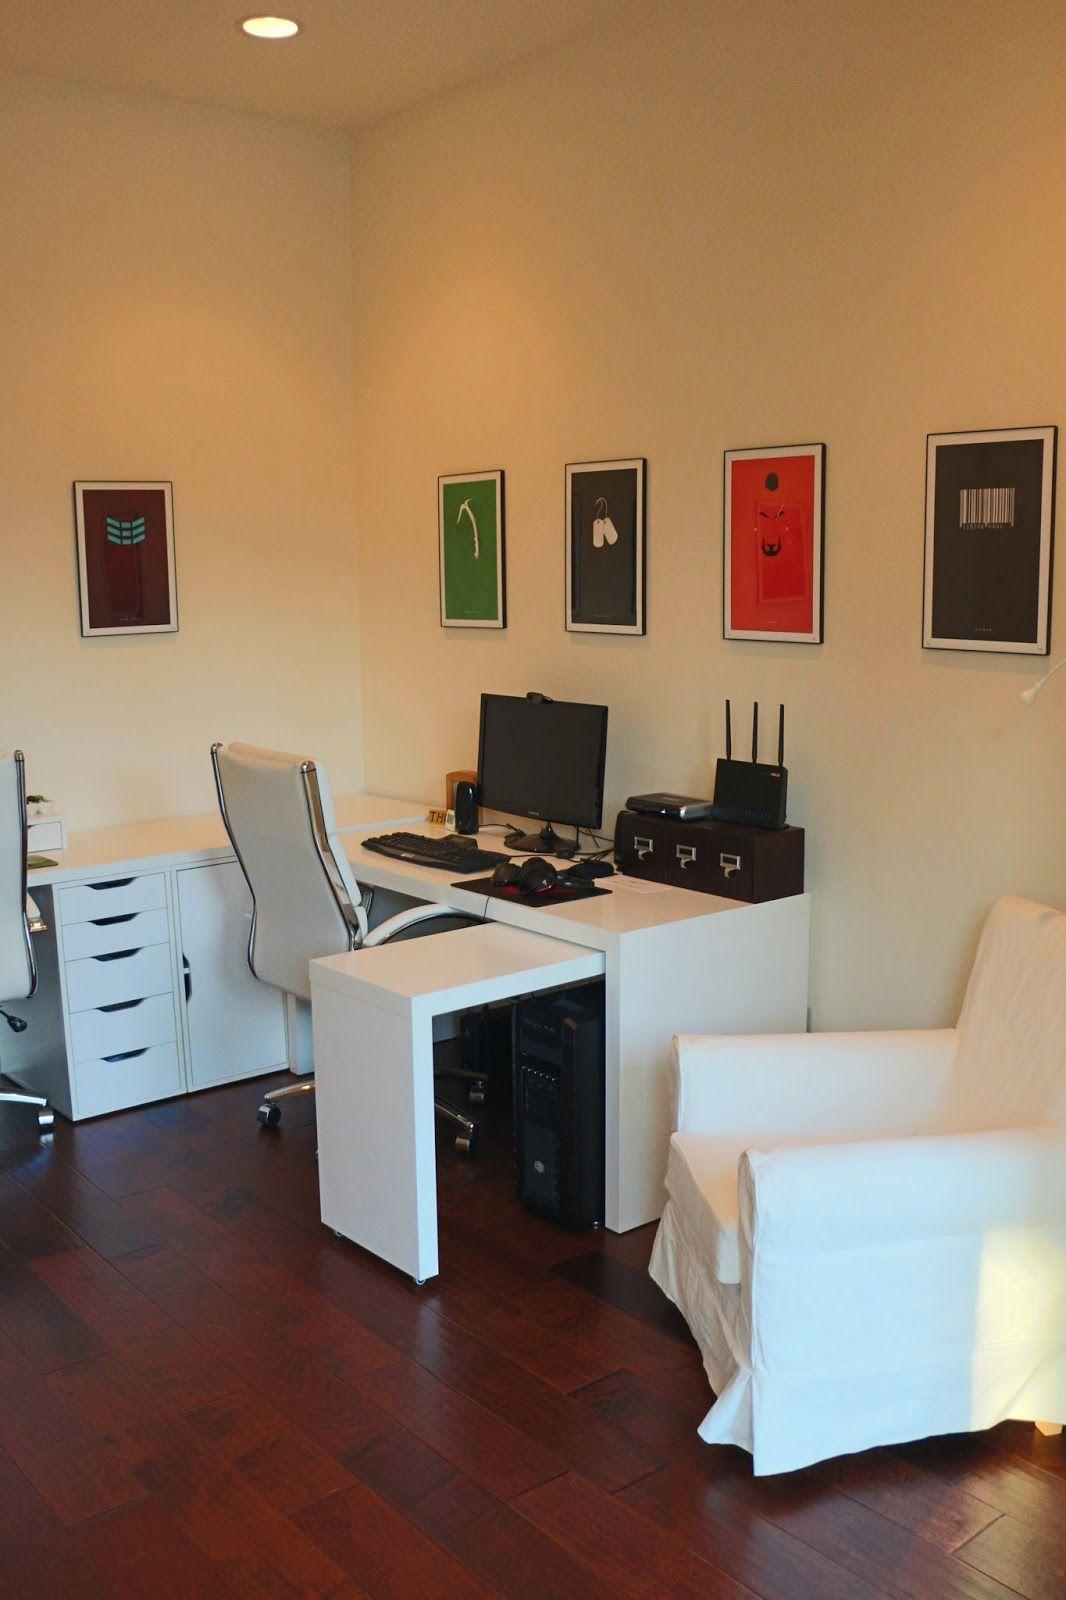 White Ikea Malm Desk Jennylund Chair Video Minimalist Prints